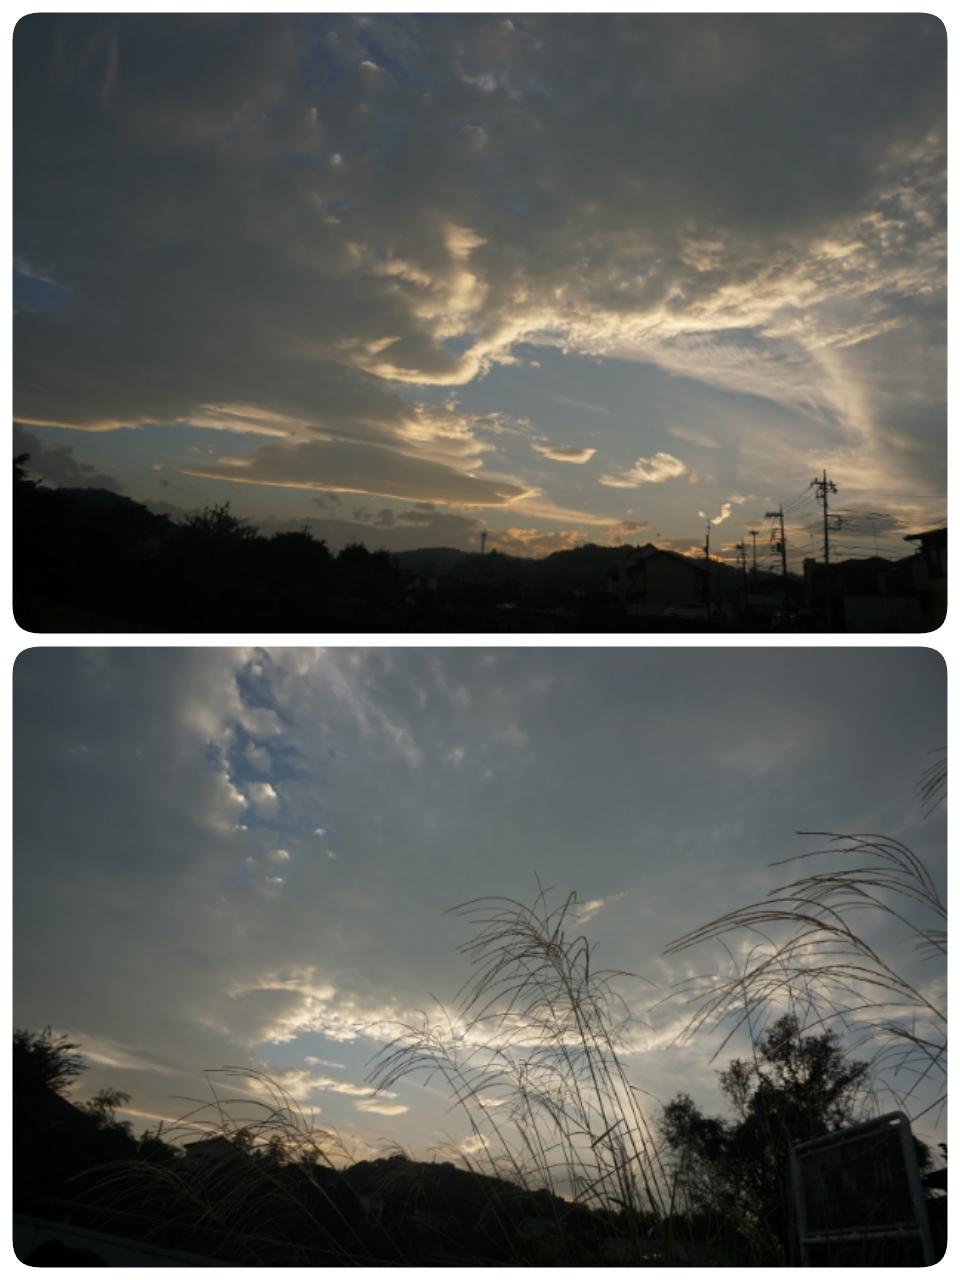 16-10-09-06-16-15-785_deco.jpg